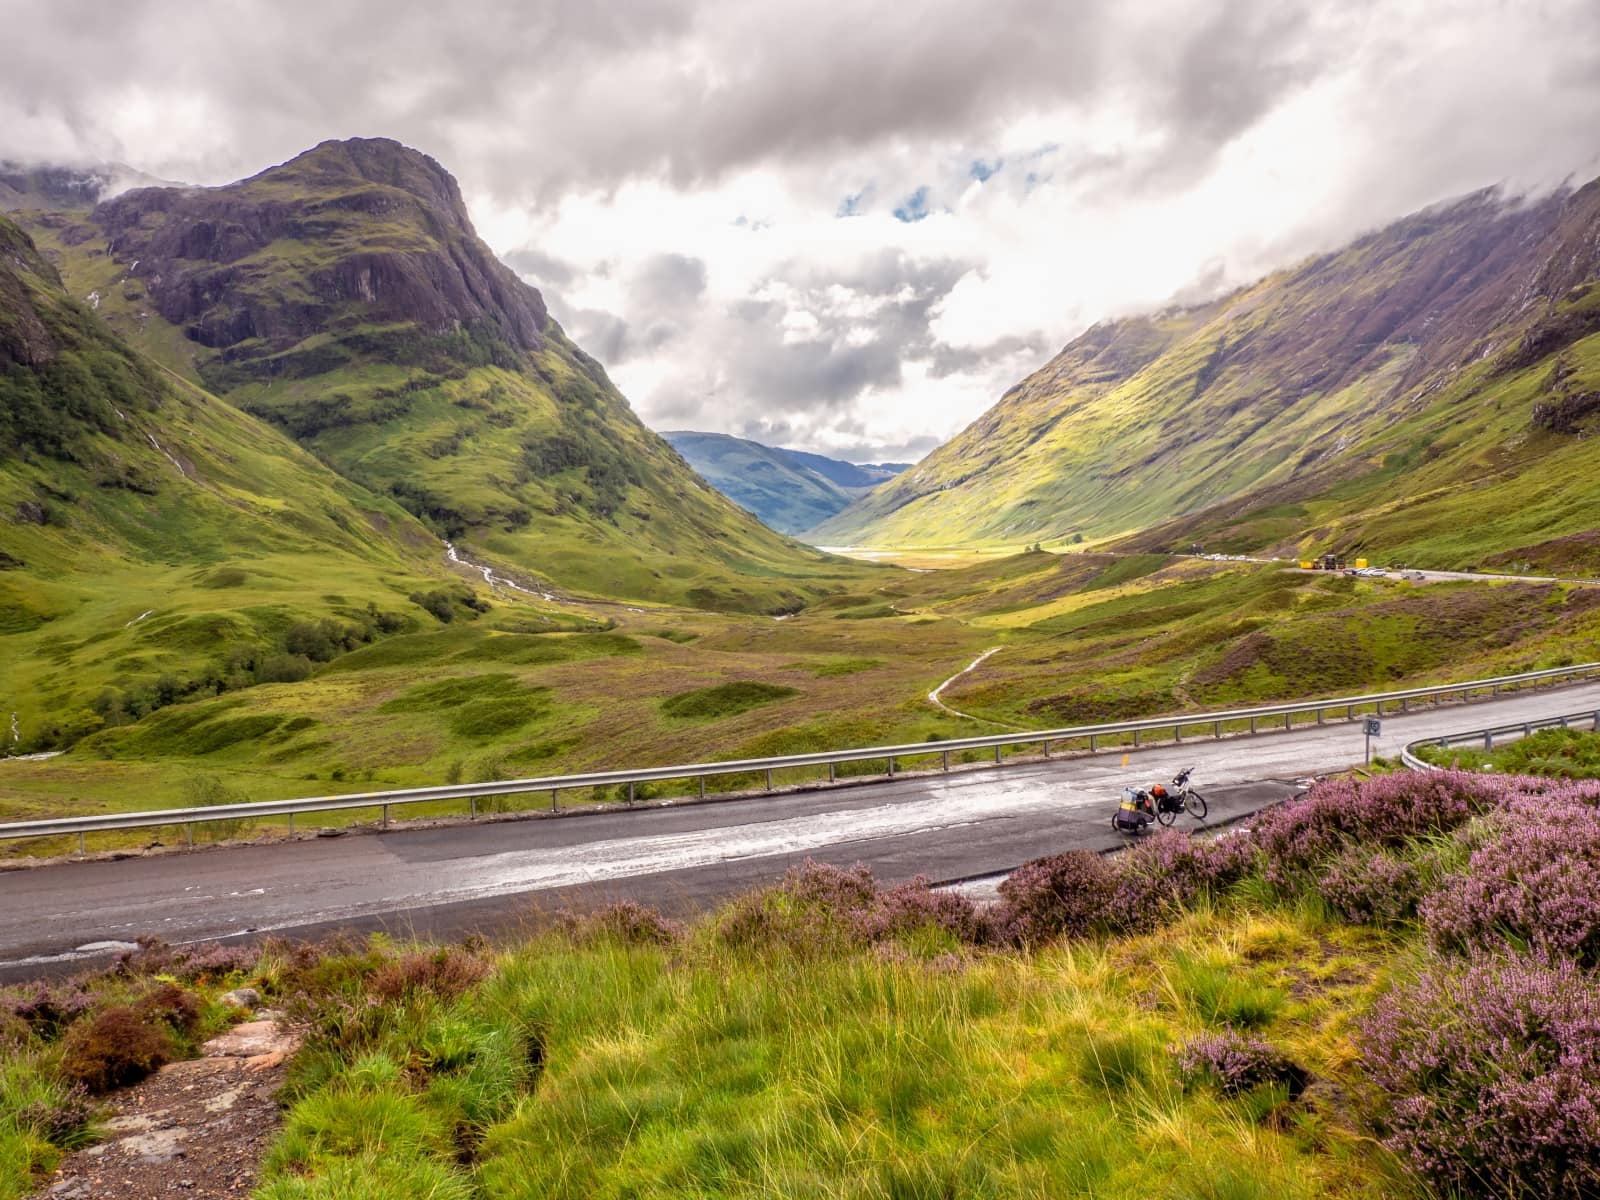 Schottland-8215787-Bearbeitet-Bearbeitet